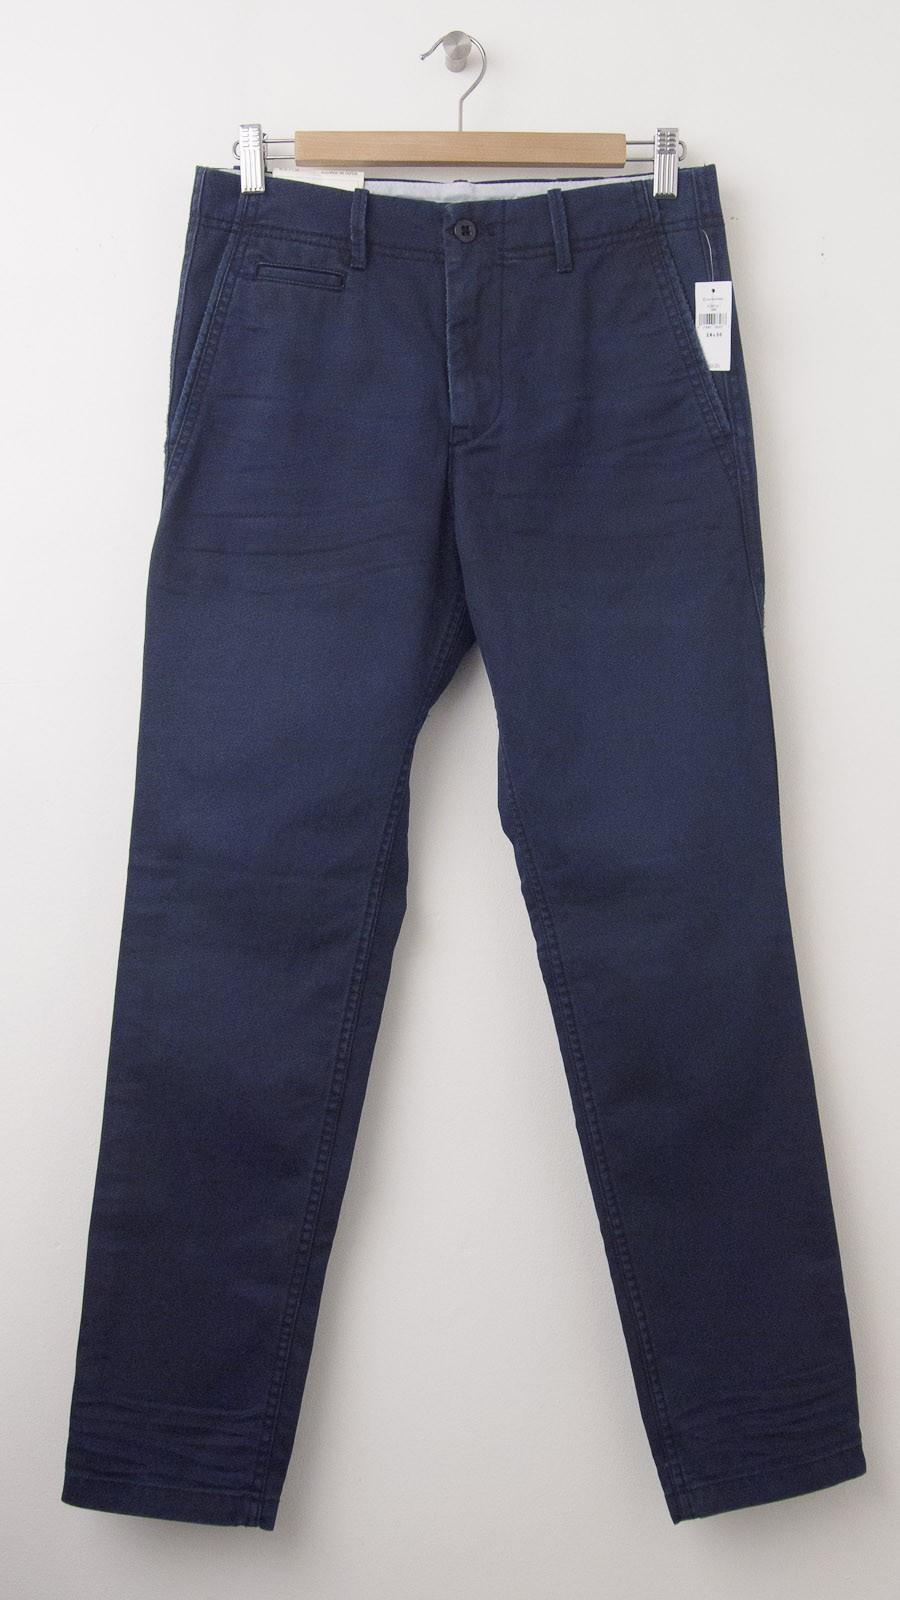 NEW Gap Lived-In Taper Khaki Pants in Midnight Fog